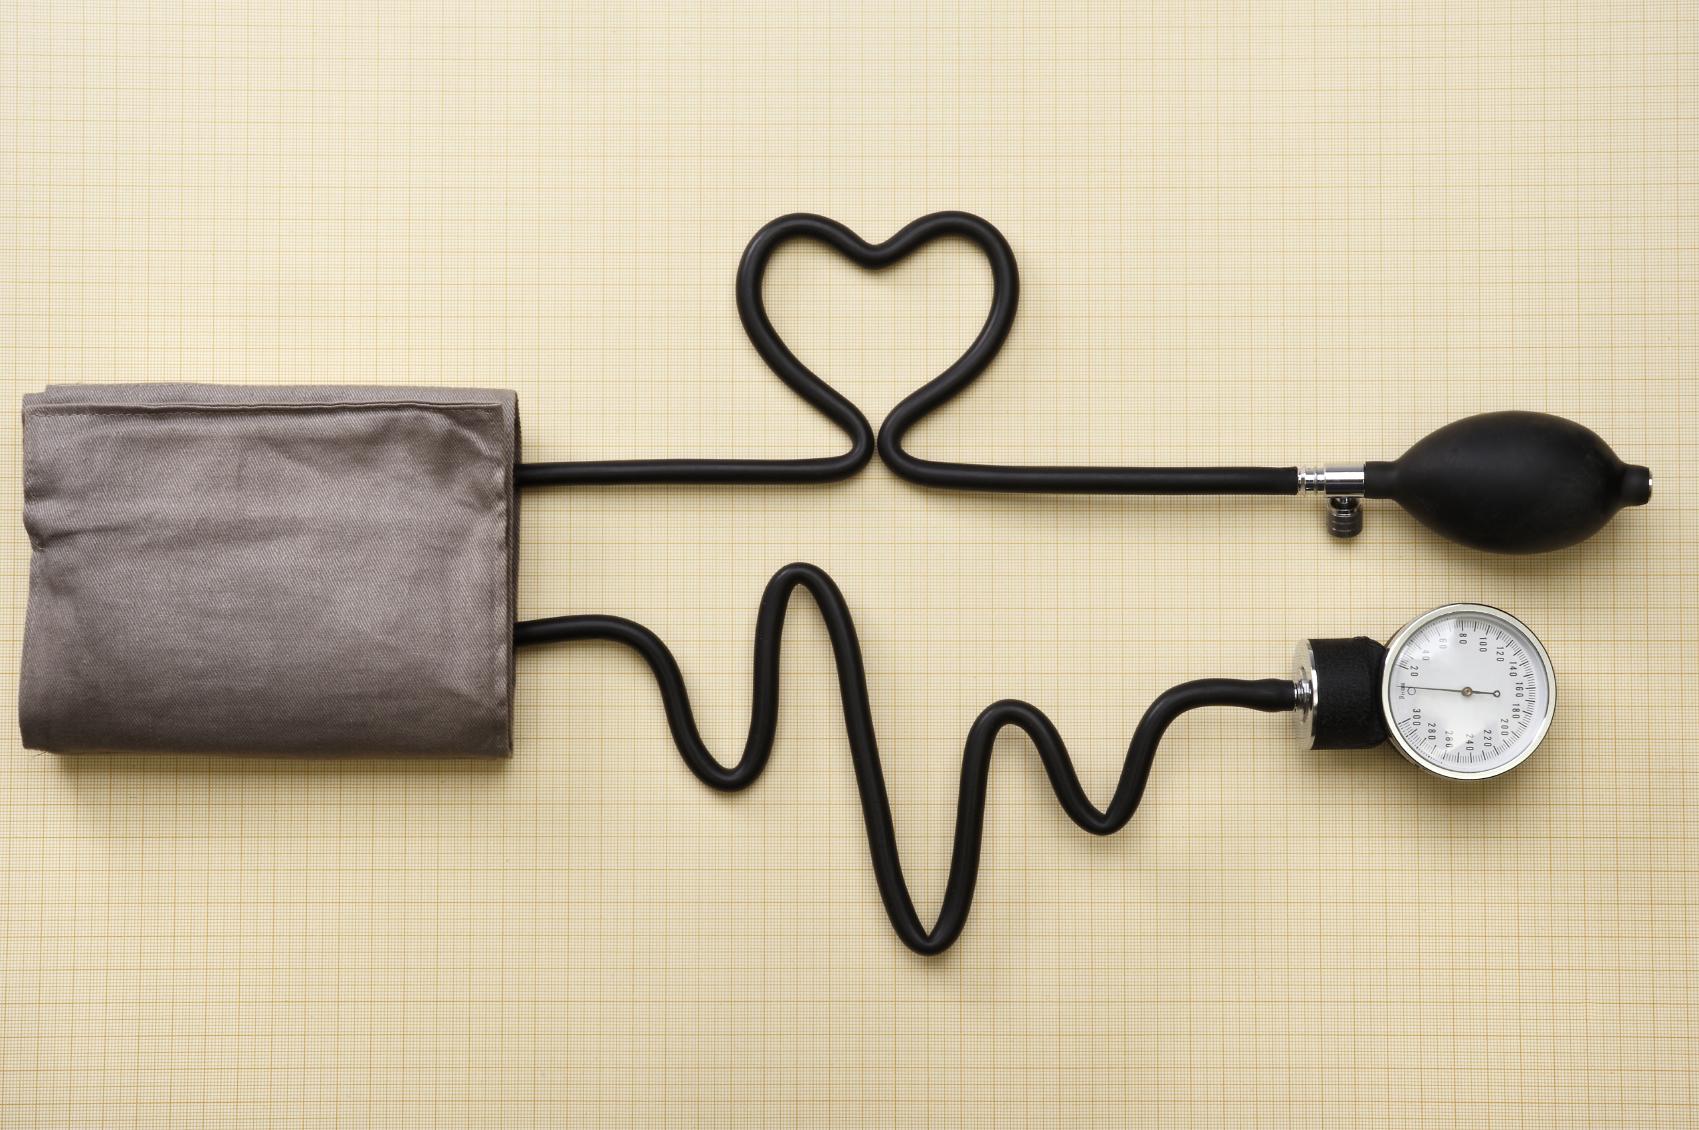 magas vérnyomás 2 fok mcb 10